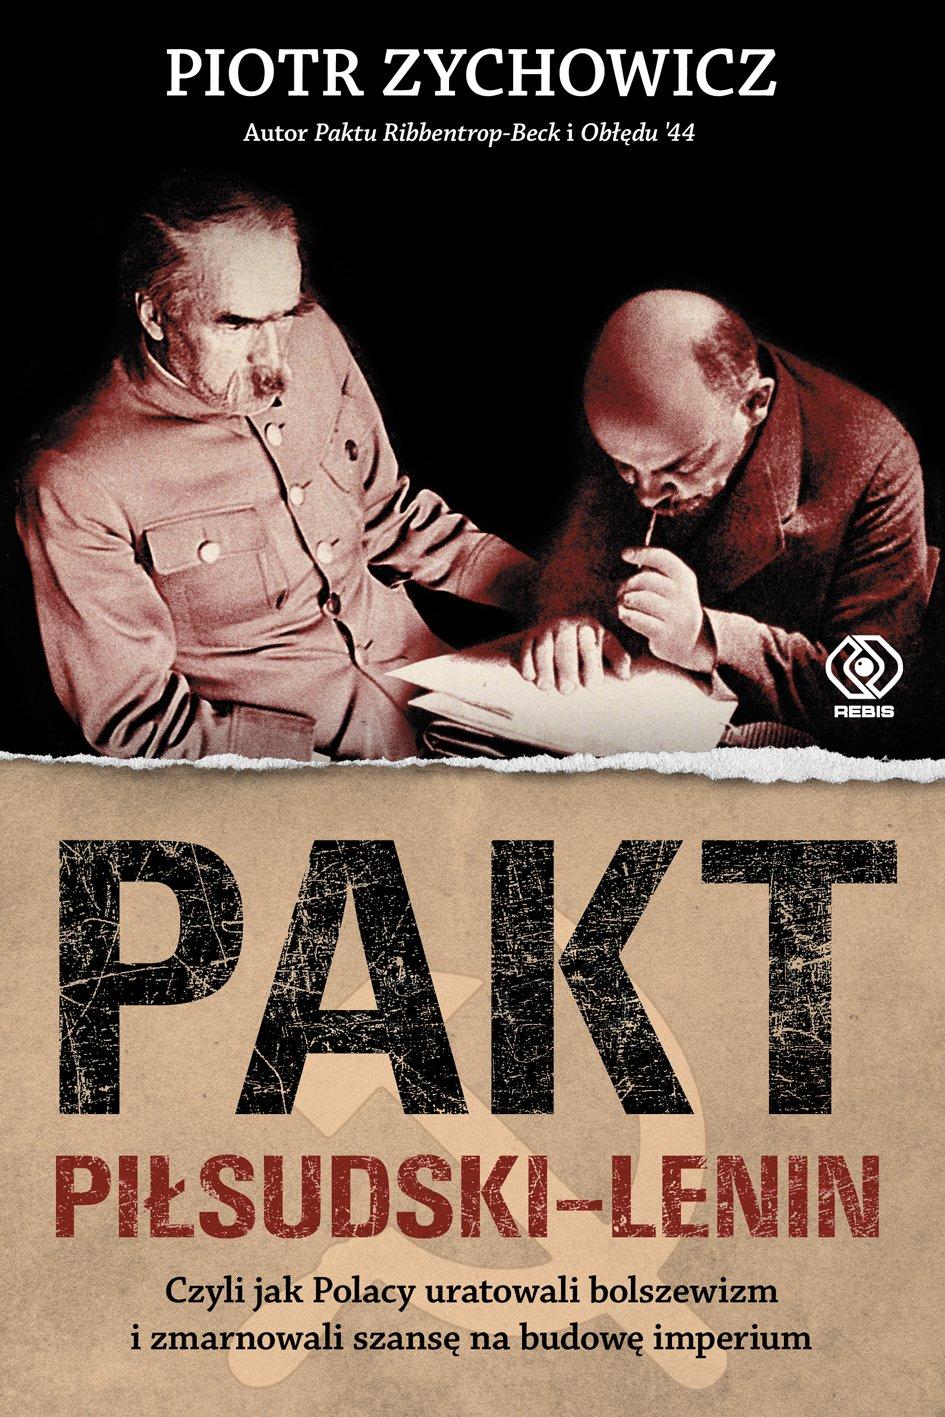 Pakt Piłsudski-Lenin - Ebook (Książka na Kindle) do pobrania w formacie MOBI